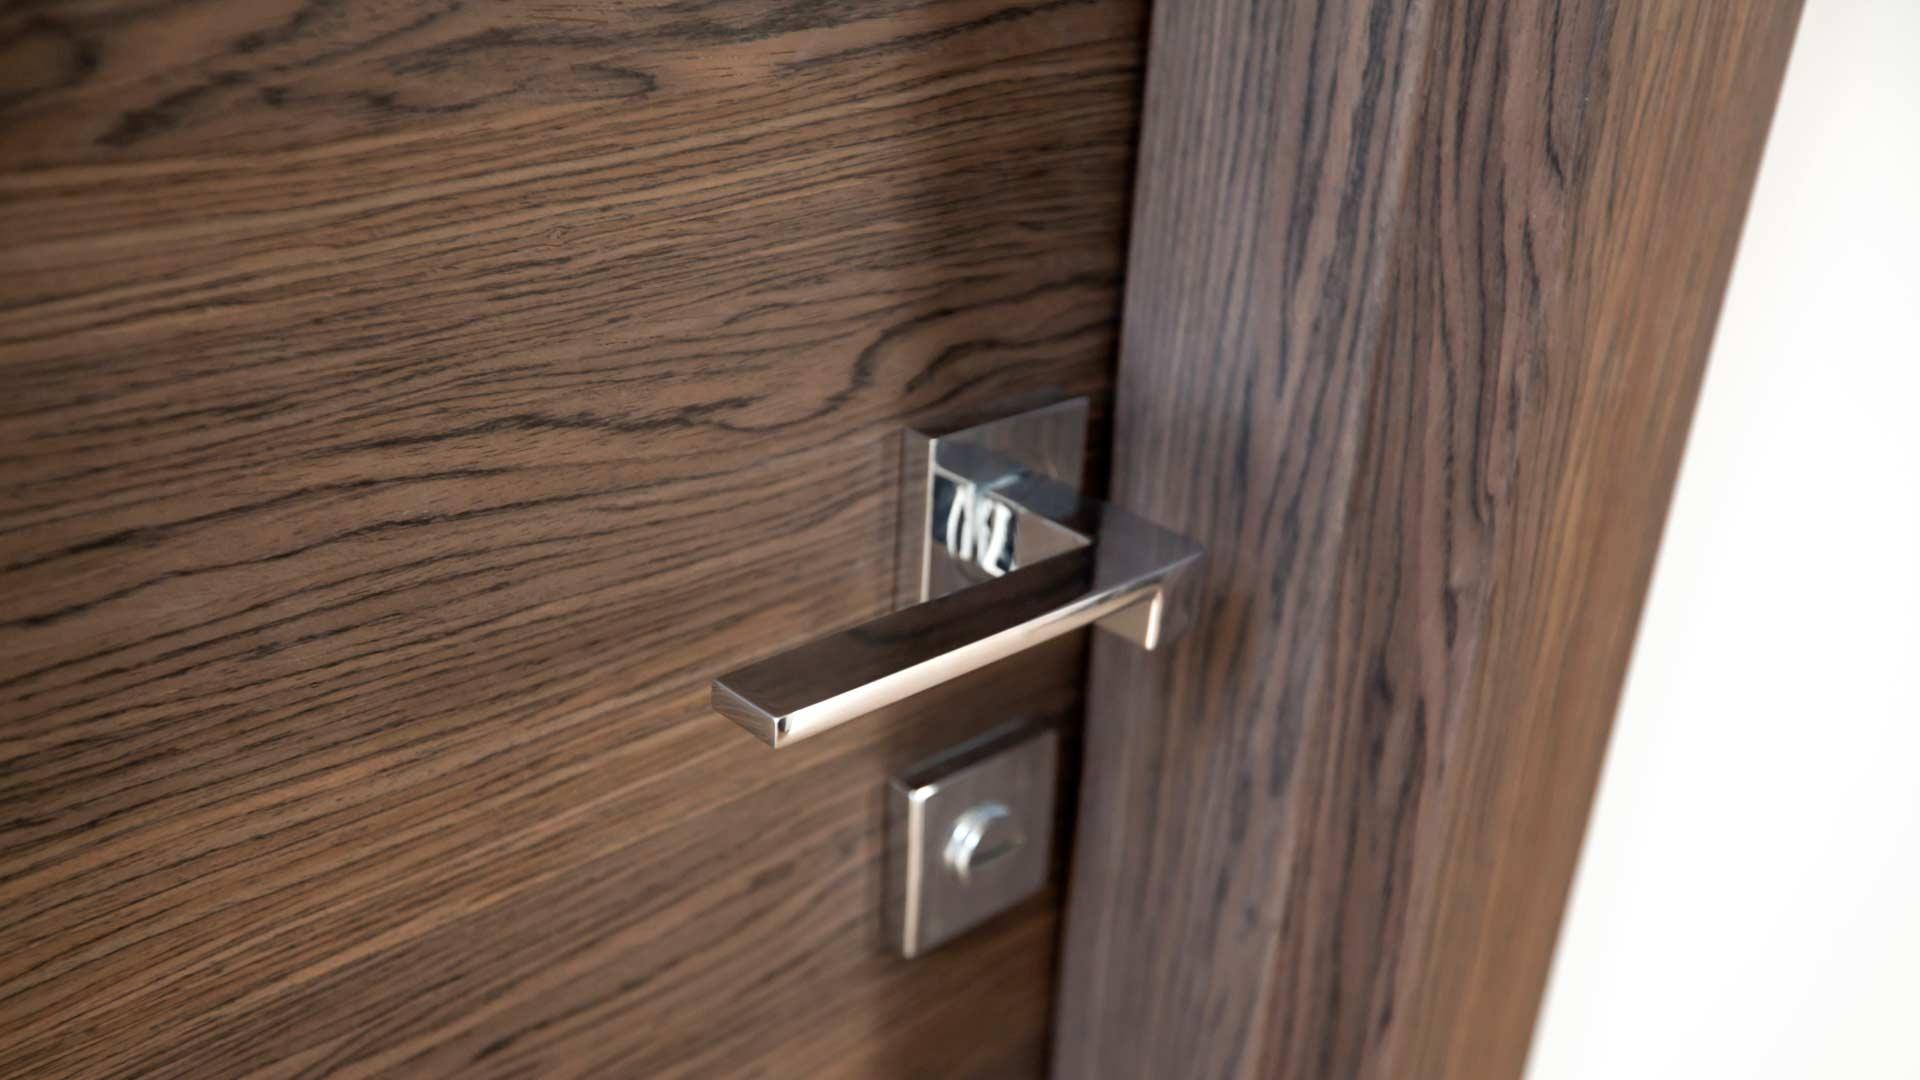 Interior Door Lever Detail (polished chrome) - Minimalist Modern - Indian Head Park - Chicago, Illinois - HAUS   Architecture For Modern Lifestyles, Christopher Short, Indianapolis Architect with Joe Trojanowski